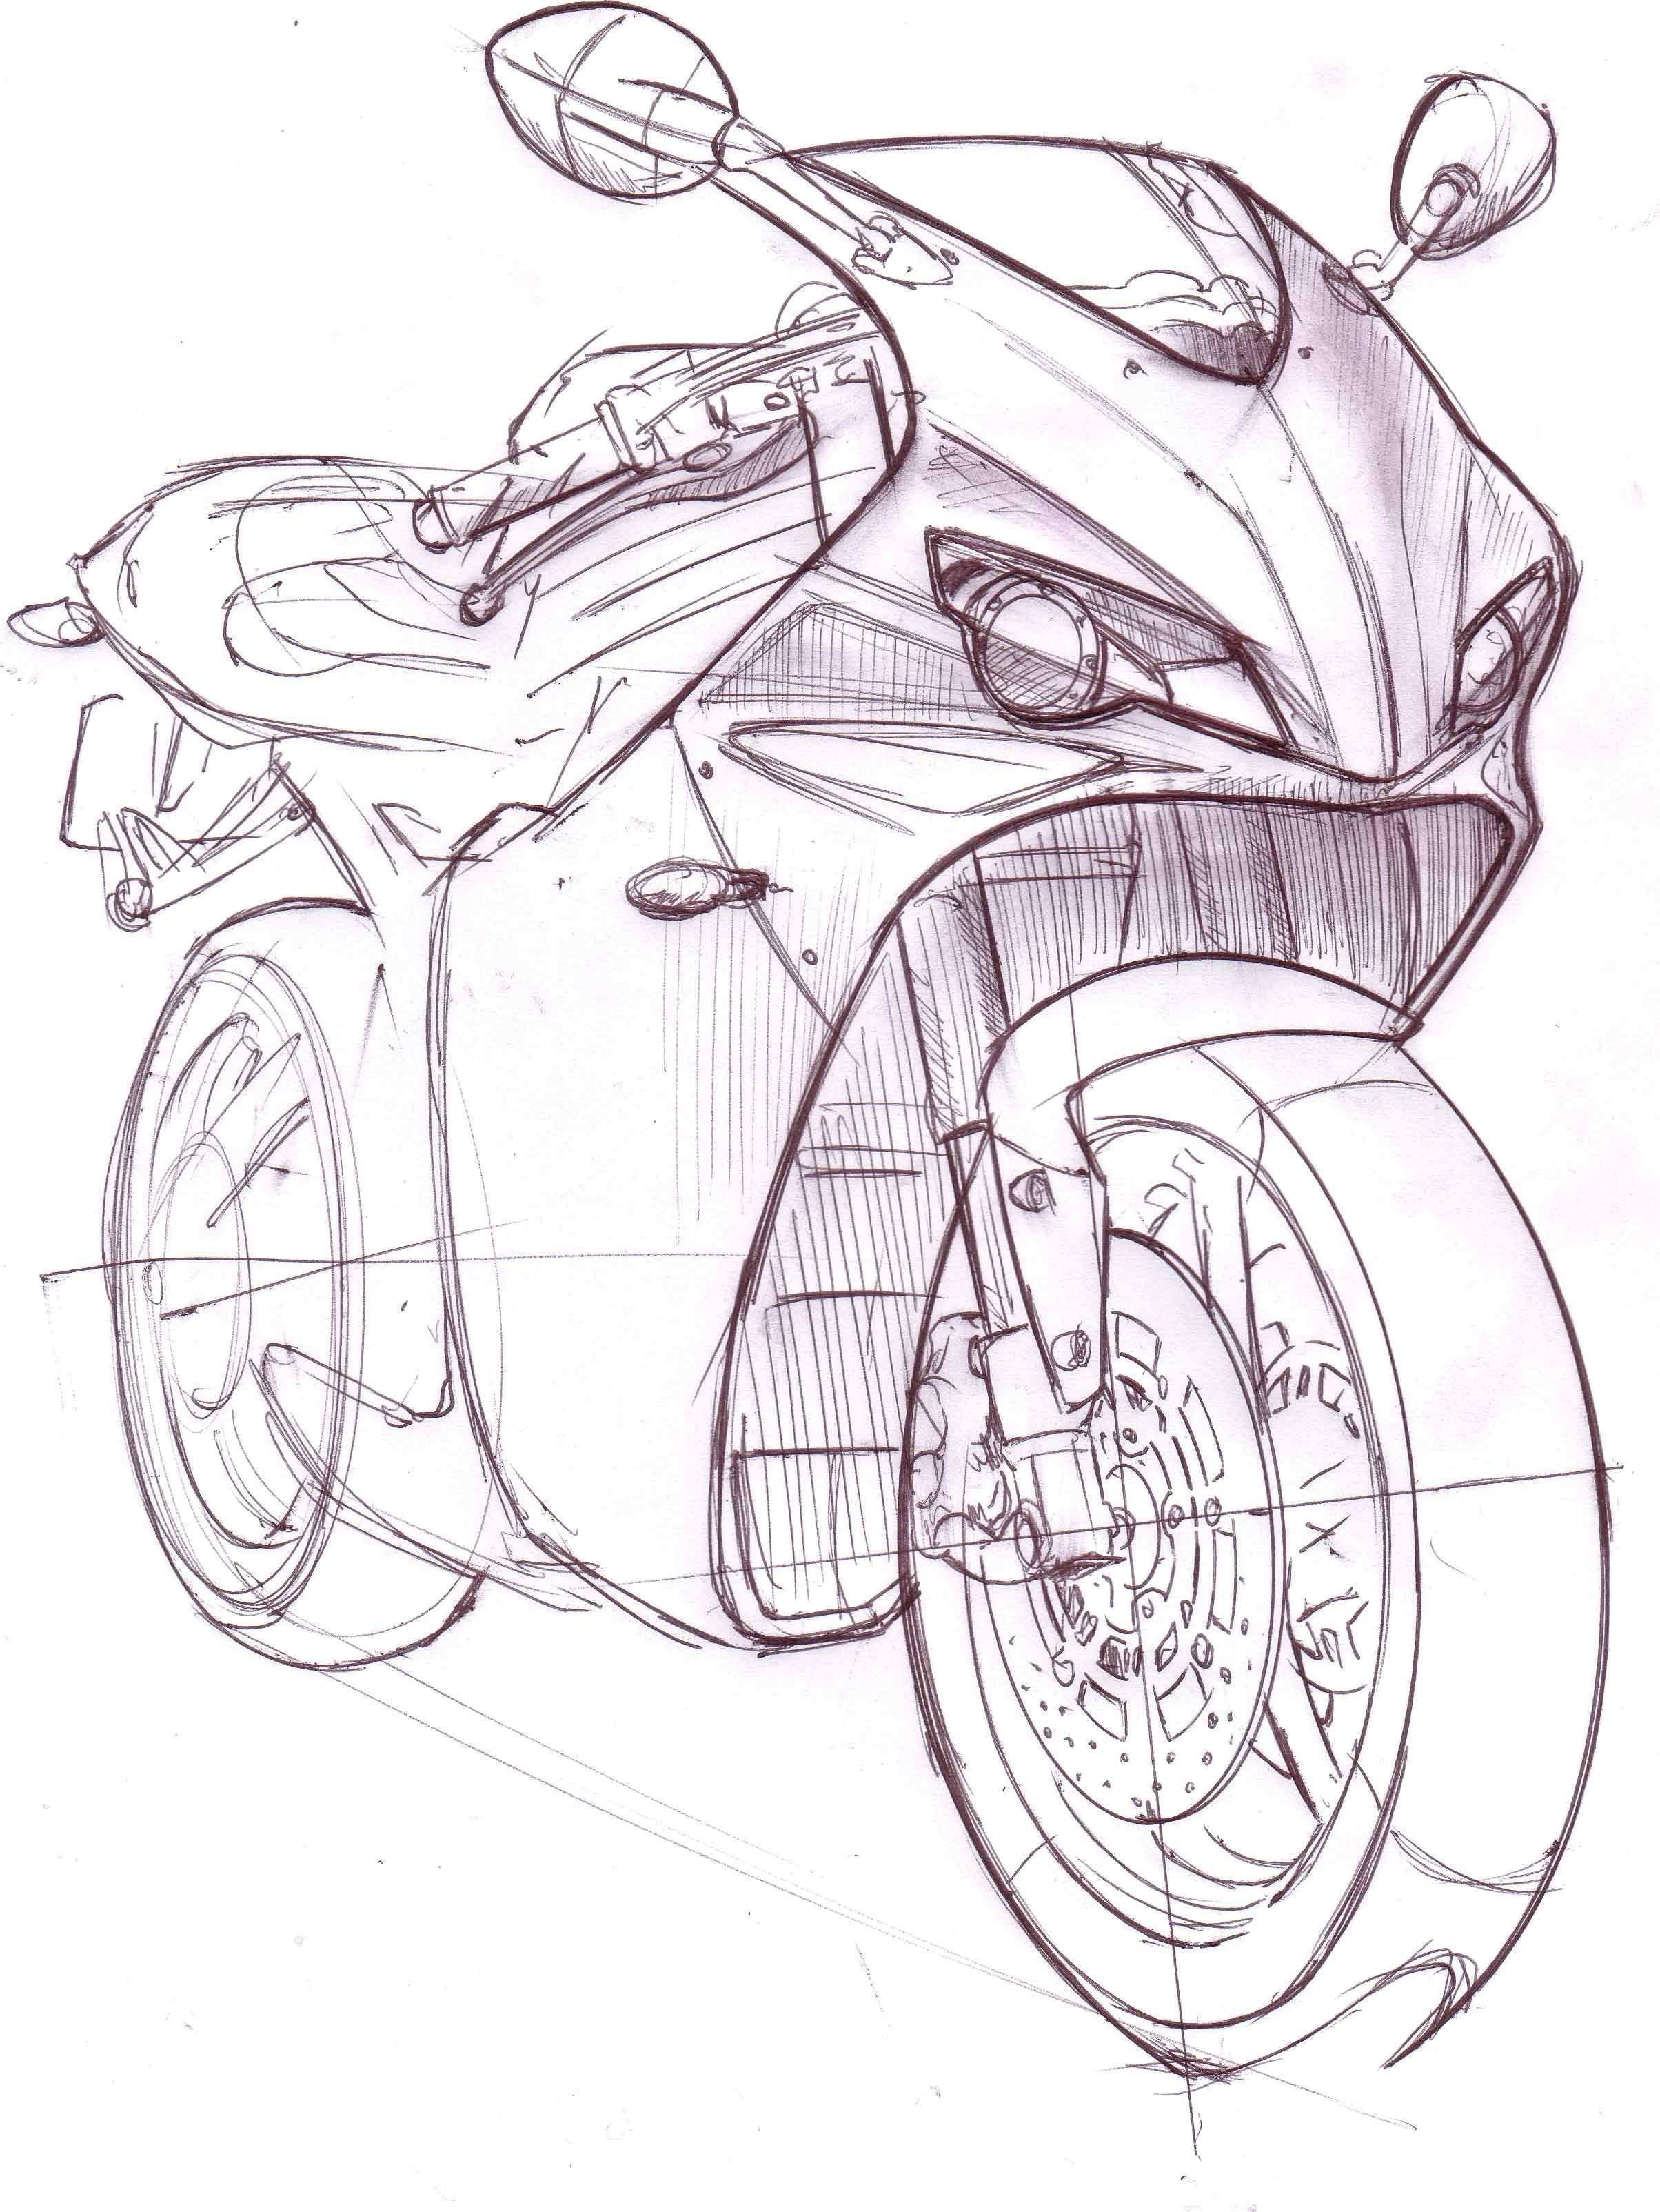 rieju rs3 by mark wells at coroflot izim pinterest Custom Suzuki Intruder 700 rieju rs3 by mark wells at coroflot bike sketch car drawings motorcycle